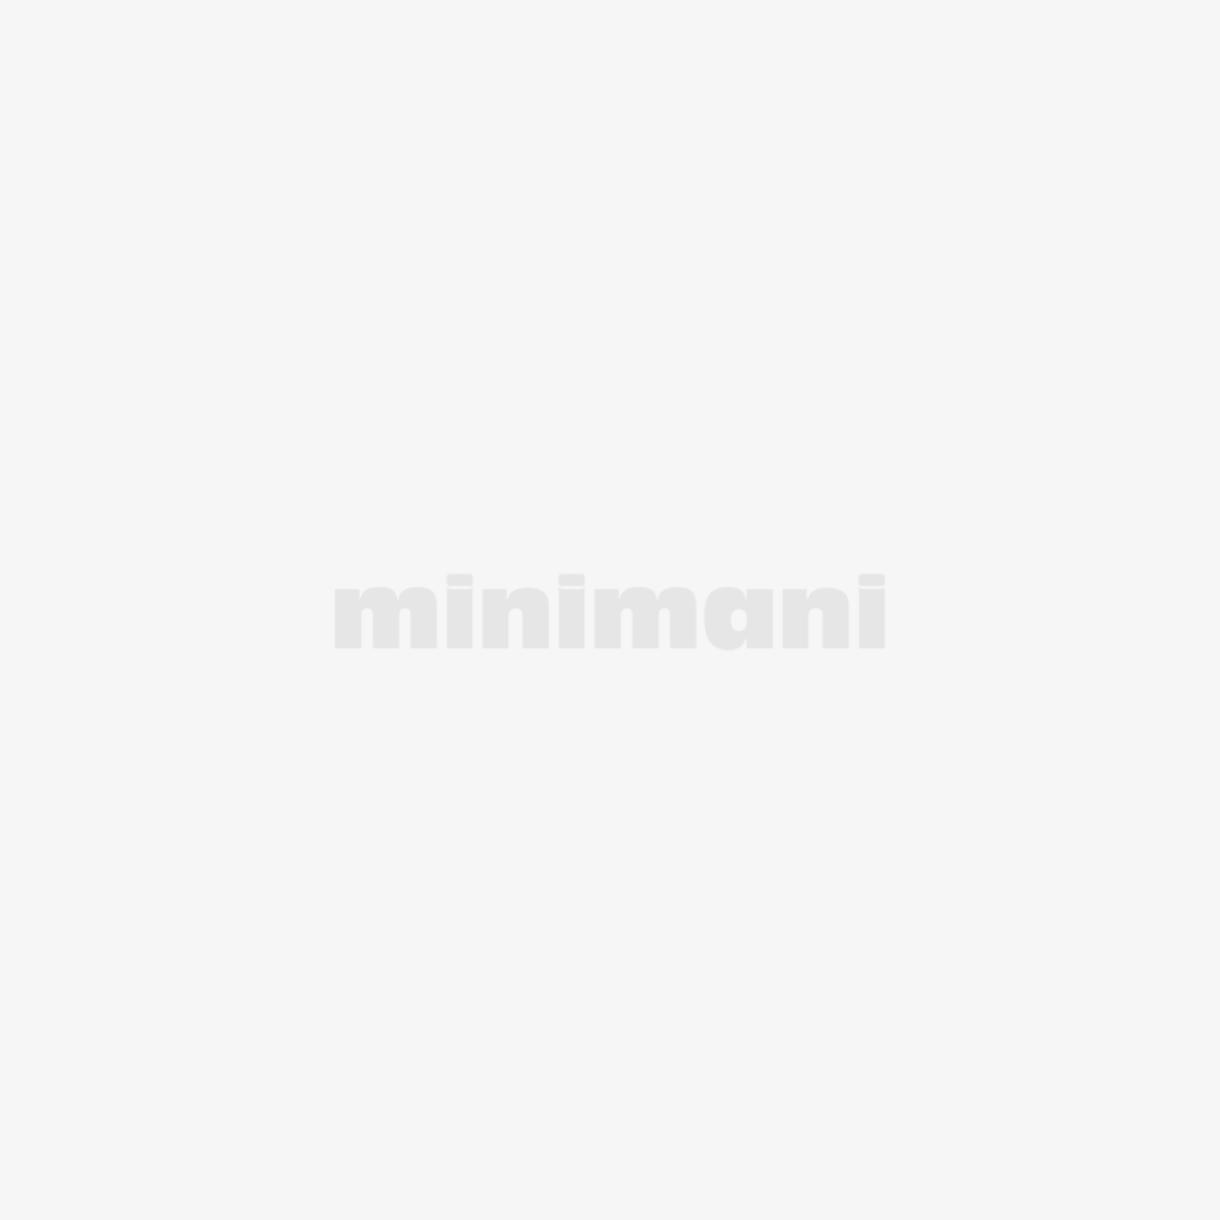 CROSSBOW NAISTEN LEGGINGS 2KPL/PKT, MUSTA 34/36